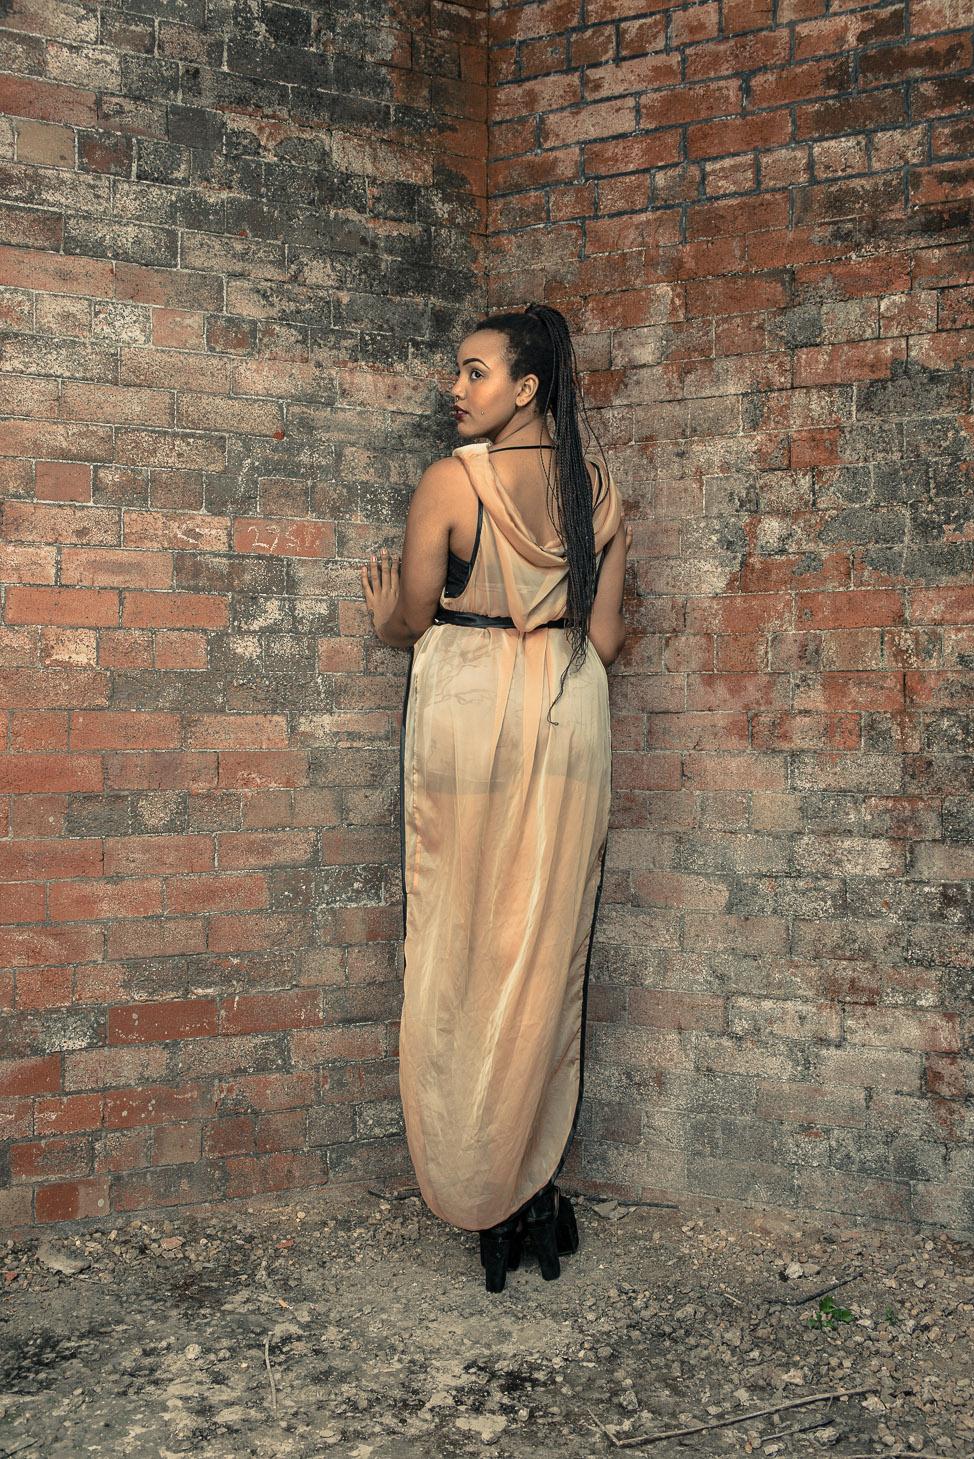 zaramia-ava-zaramiaava-leeds-fashion-designer-ethical-sustainable-tailored-minimalist-sheer-versatile-drape-dress-gold-binding-belt-wrap-cowl-styling-bodysuit-womenswear-models-photoshoot-location-3